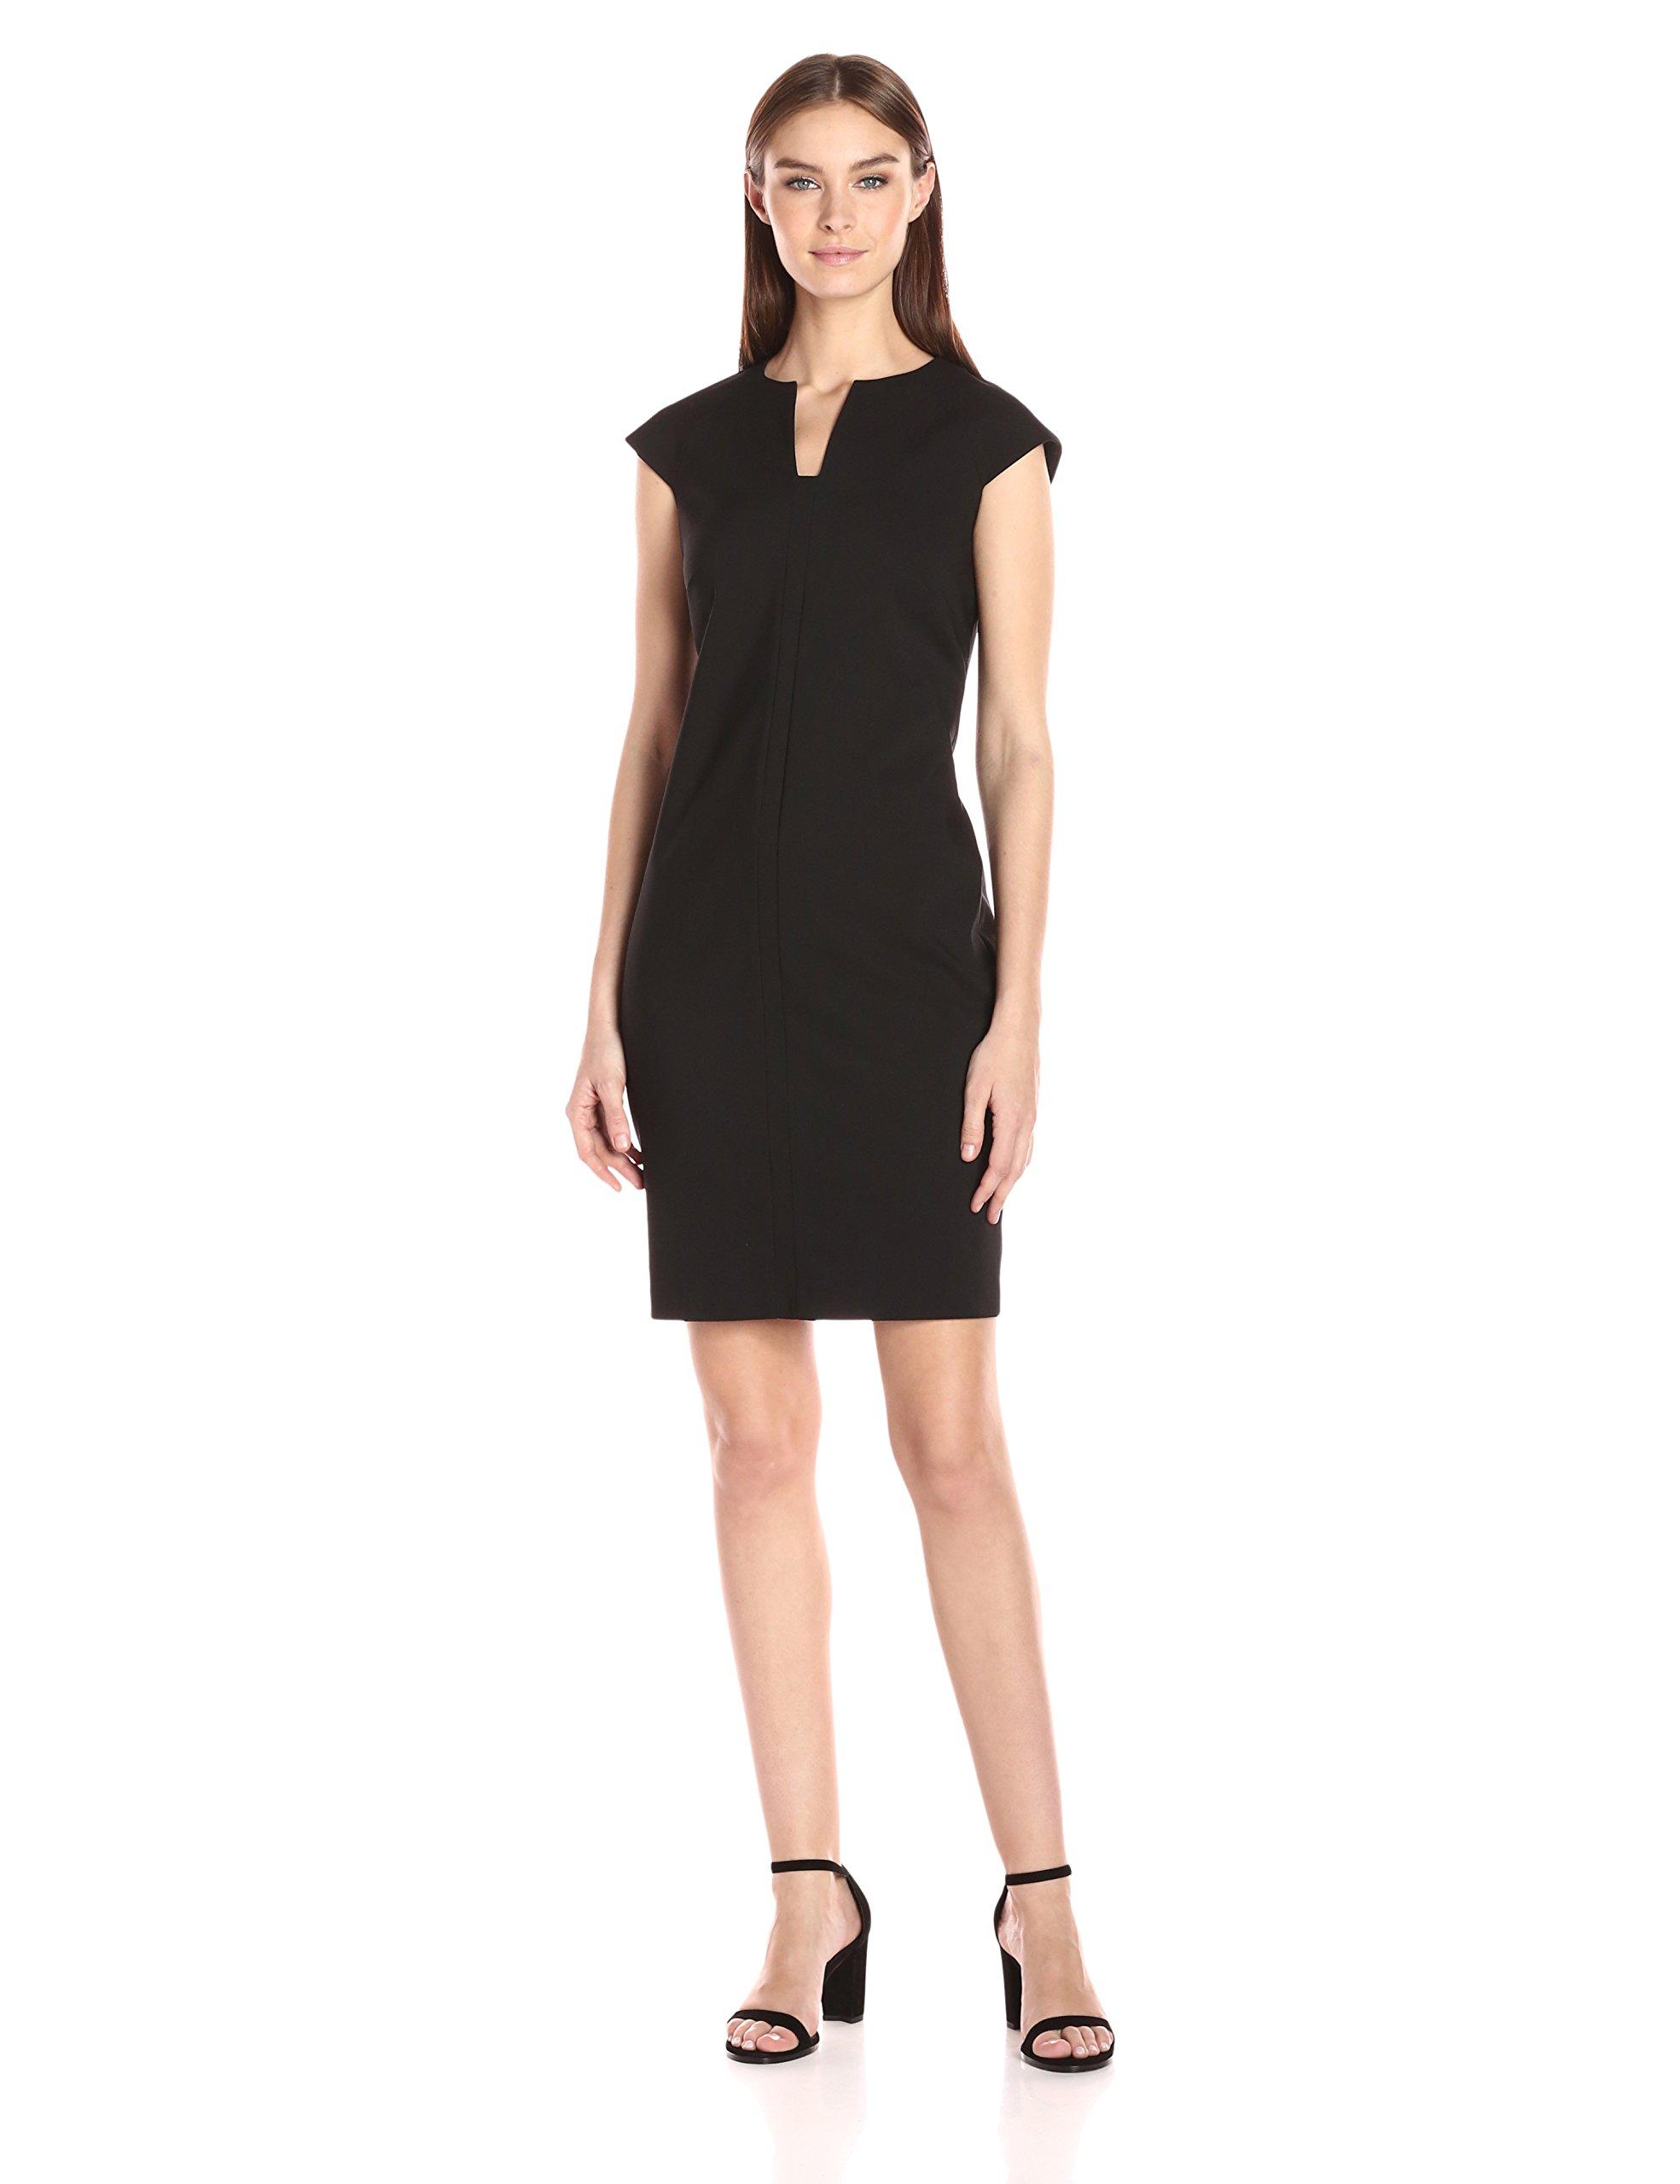 Calvin Klein Women's Compression Fabric Cap Sleeve Sheath Dress, Black, 6